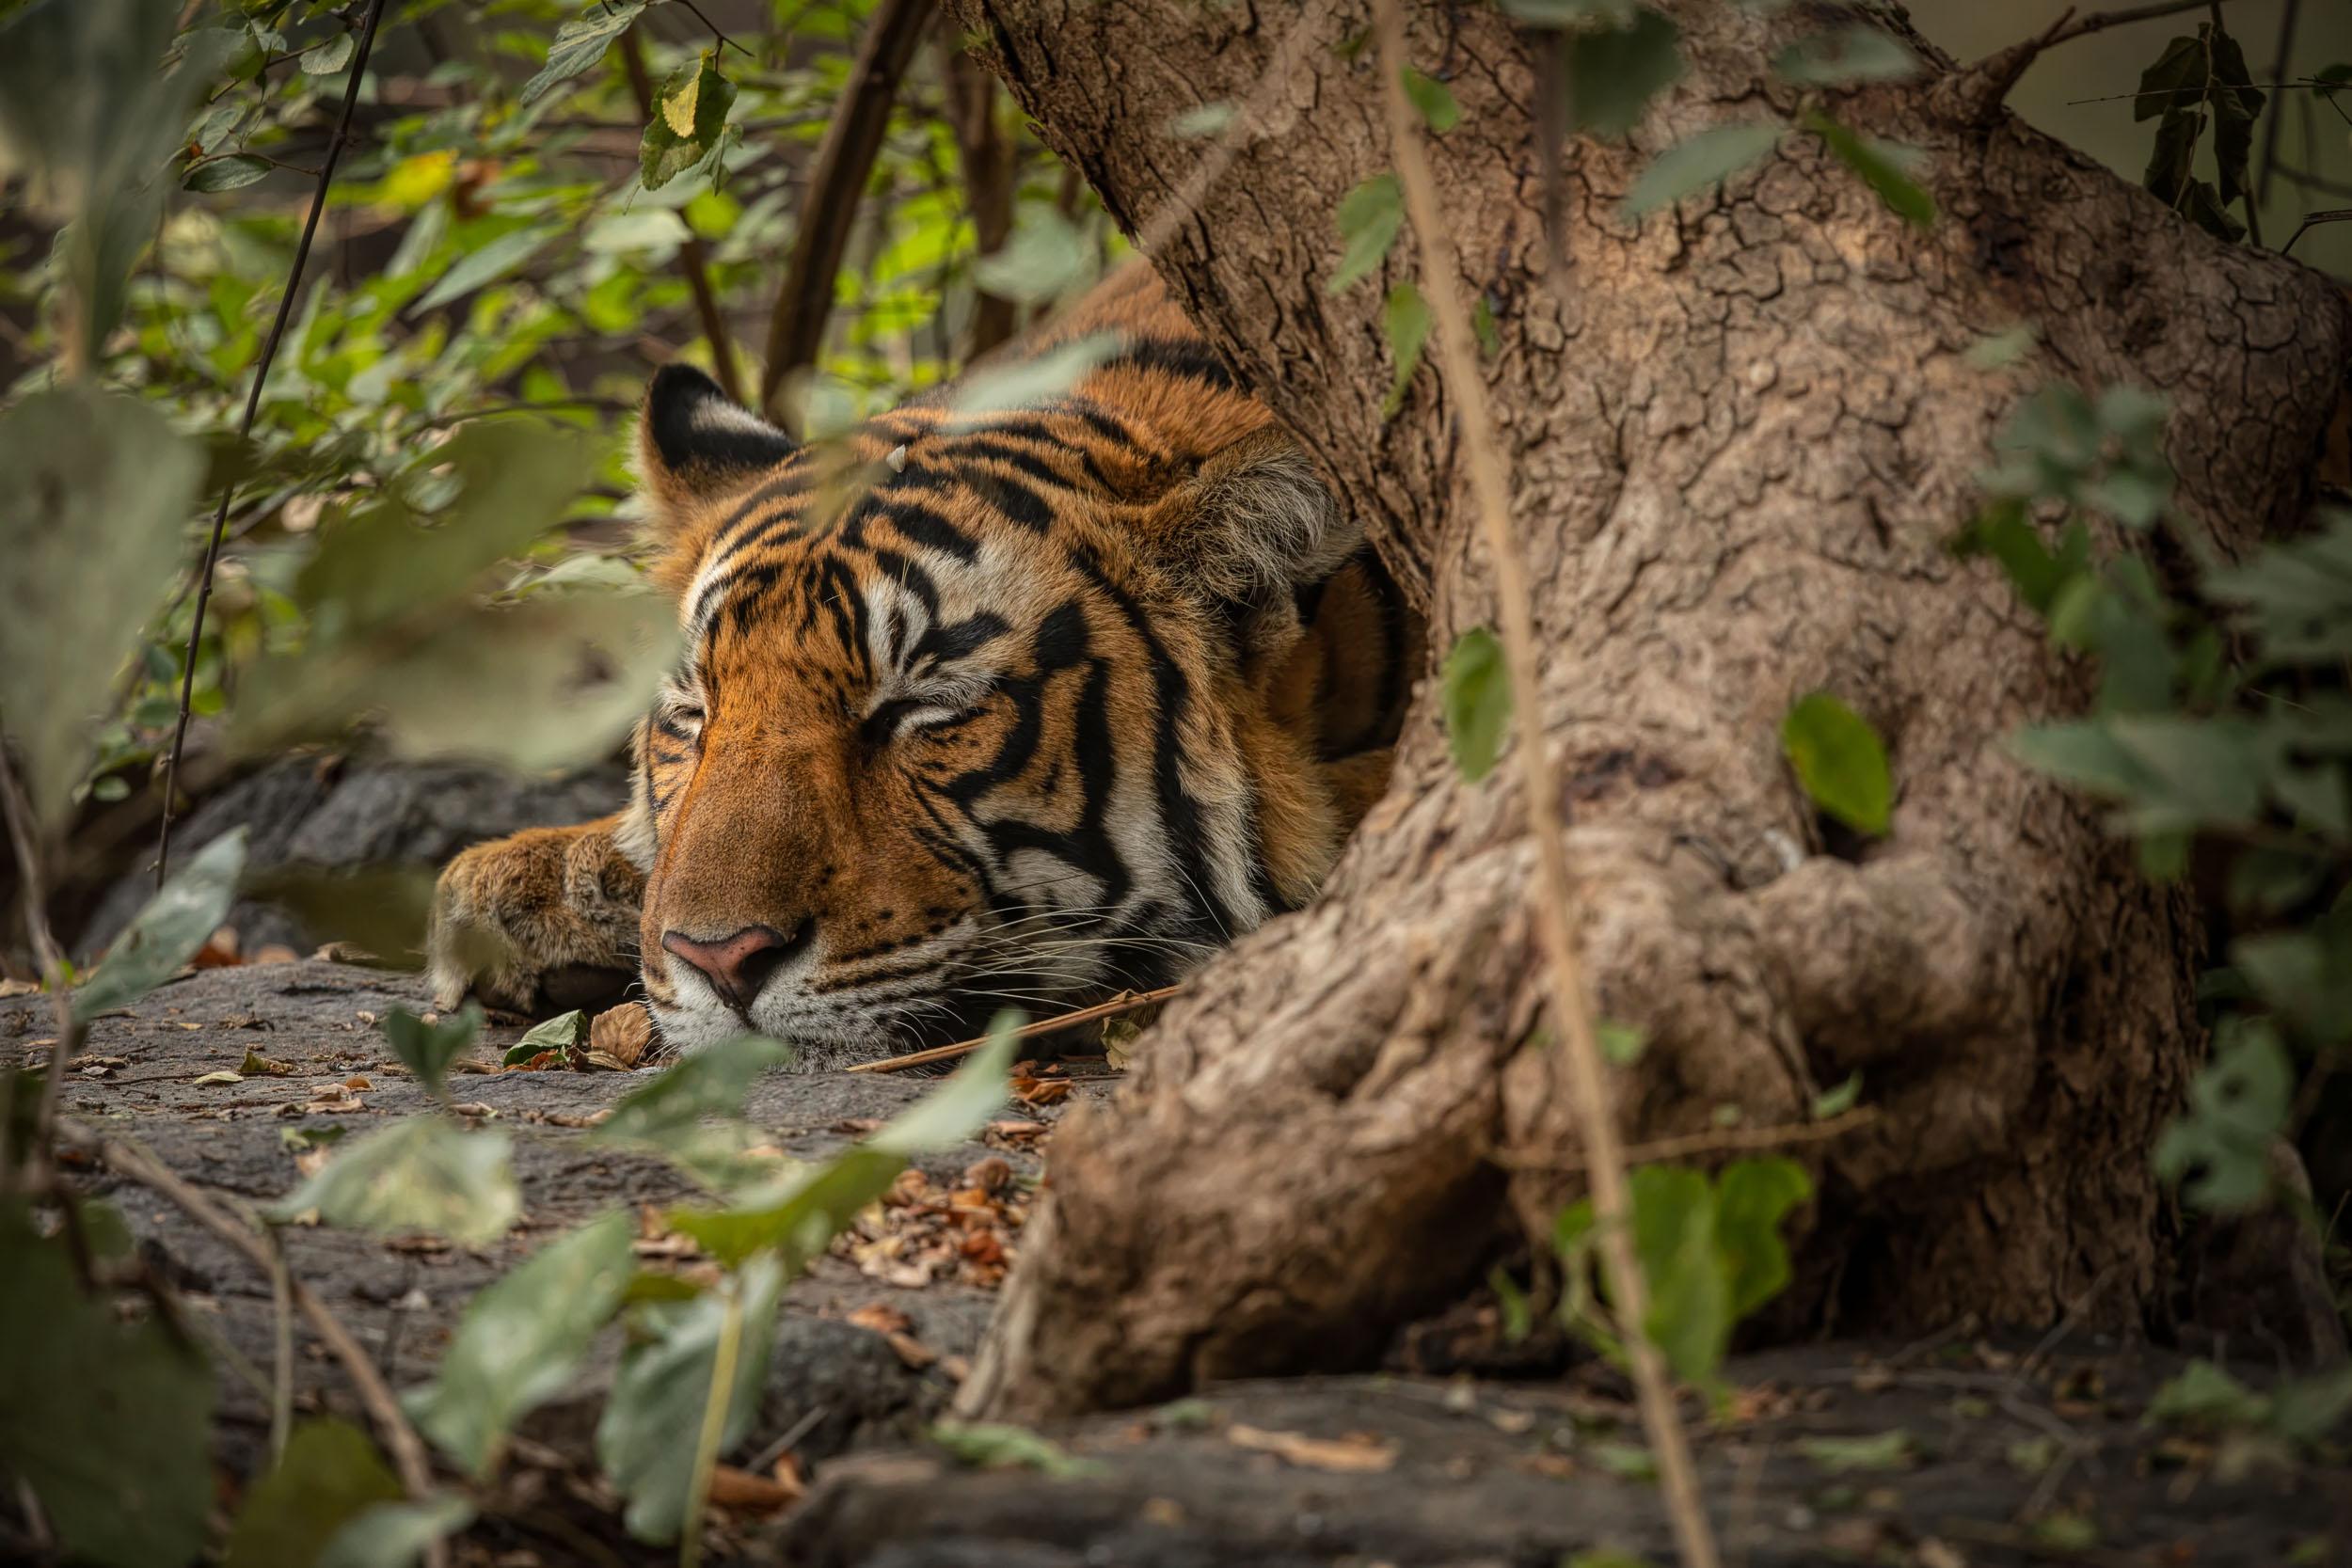 yorkshire_wildlife_photographer-16.jpg